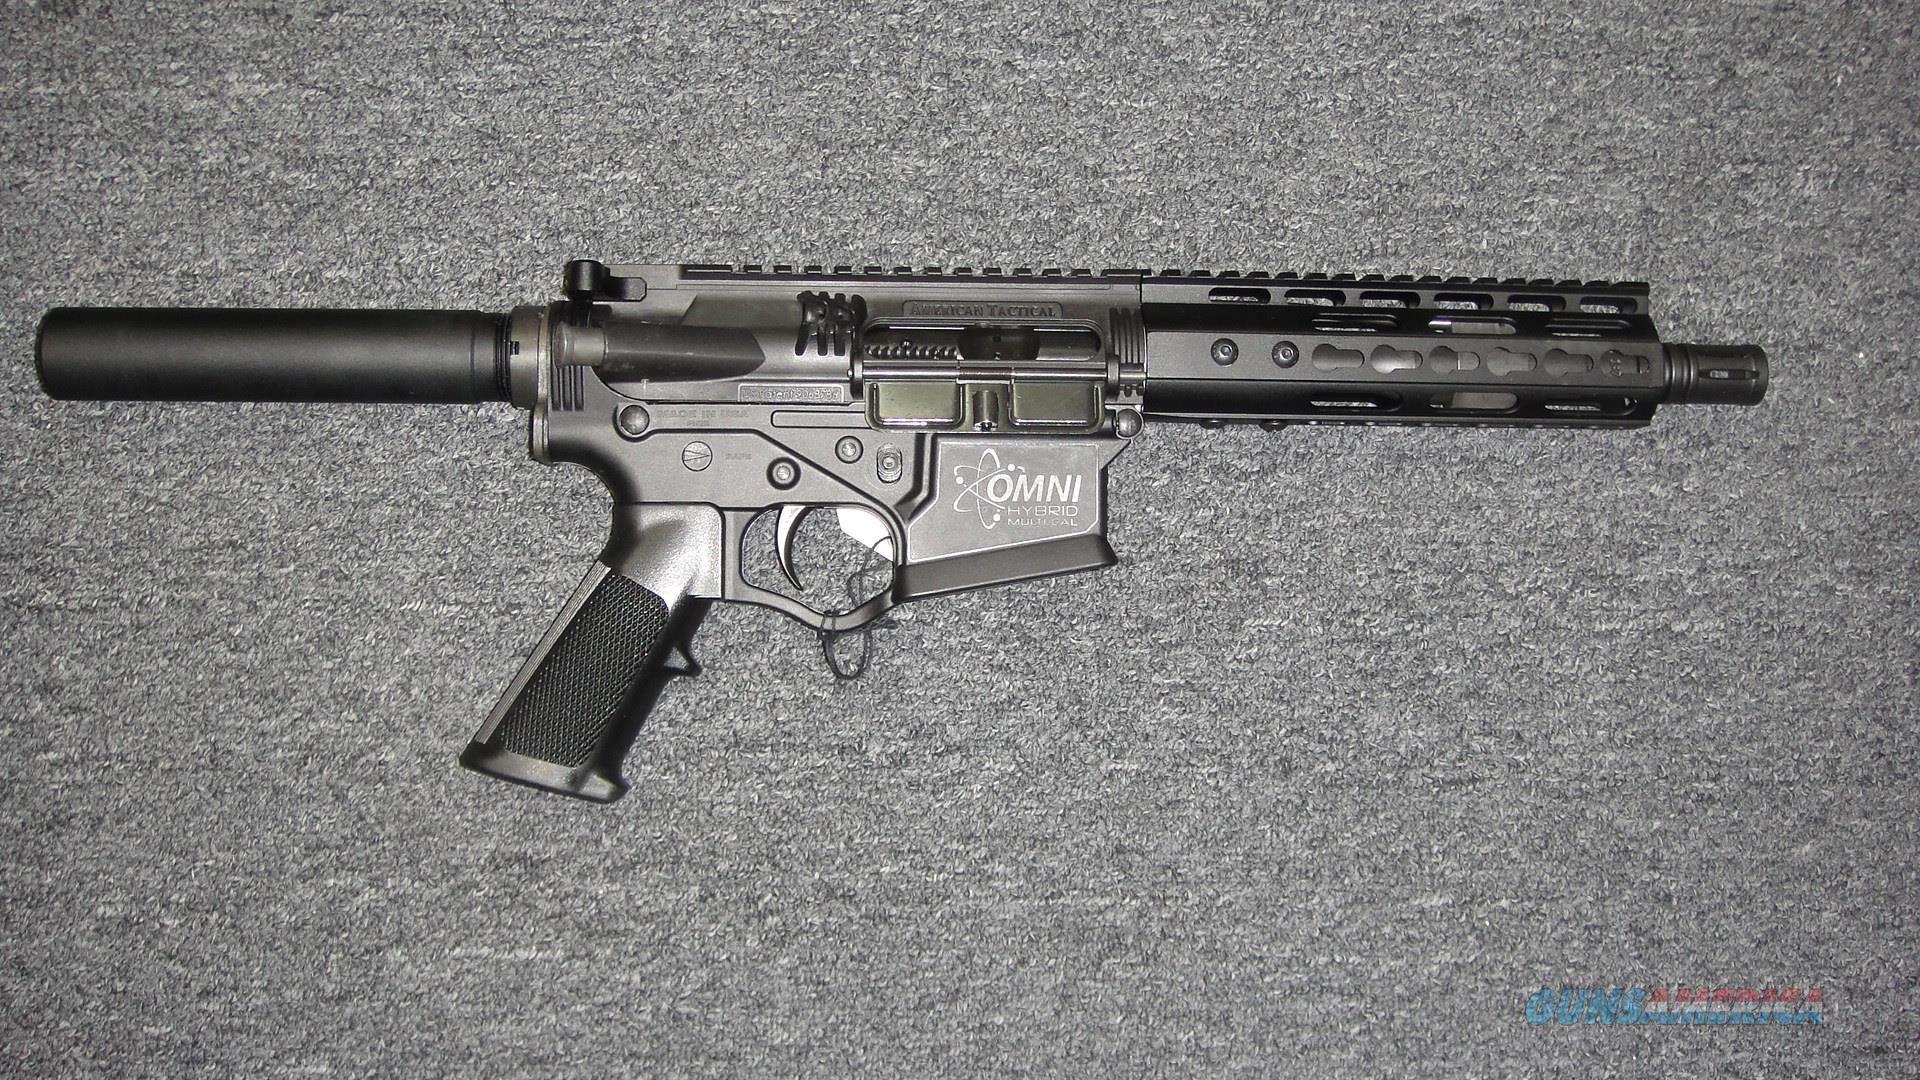 ATI OMNI Hybrid Maxx  Guns > Rifles > ATI > ATI Rifles